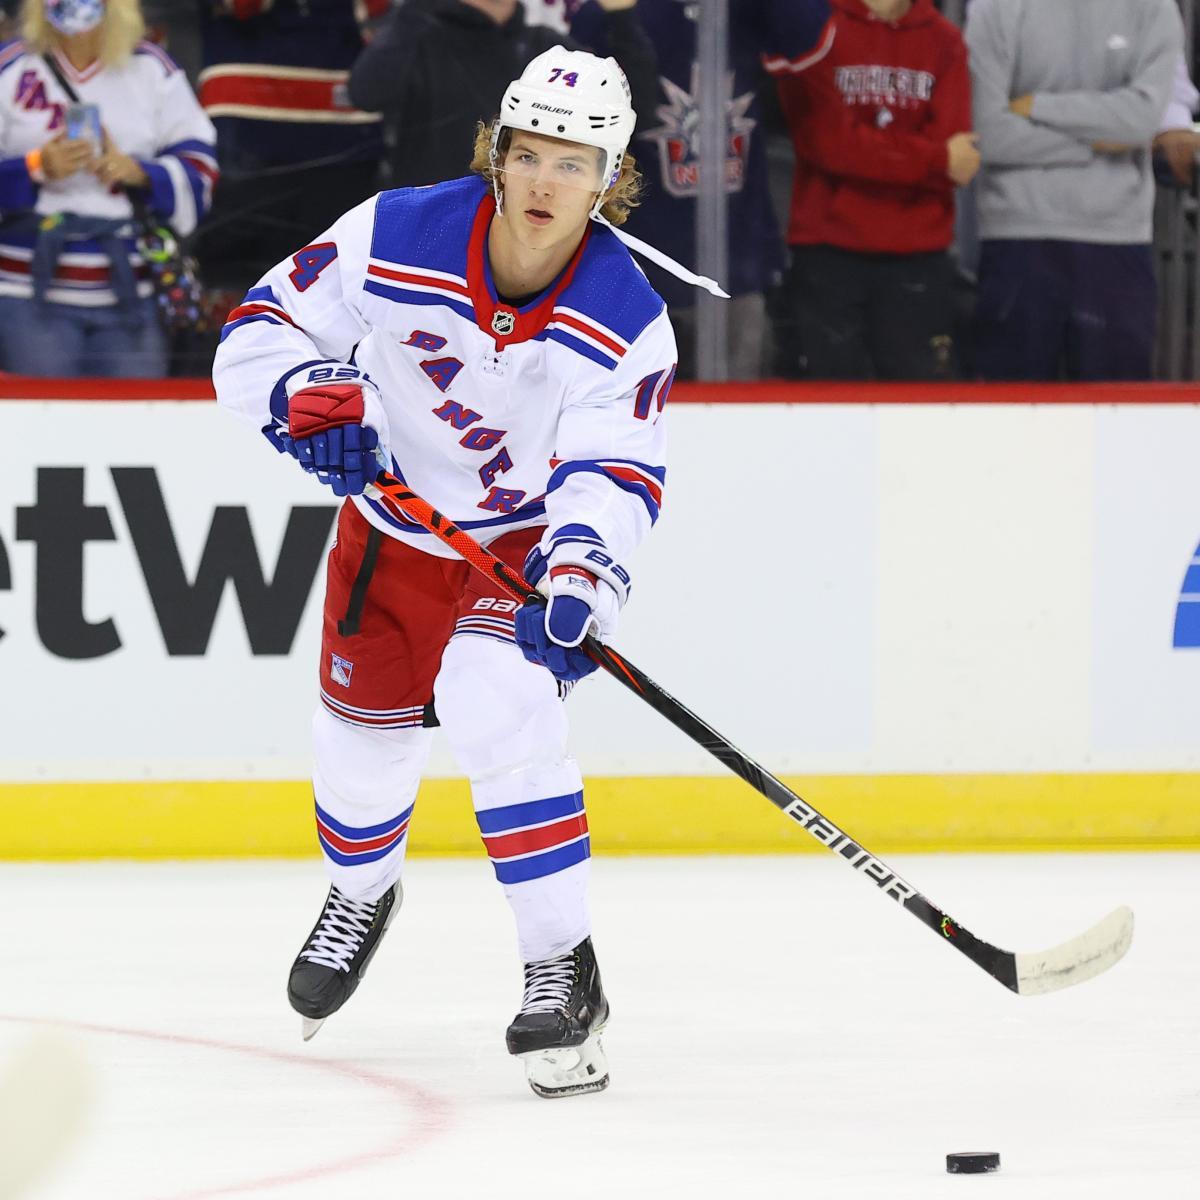 5 Potential Trade Destinations for New York Rangers Winger Vitali Kravtsov